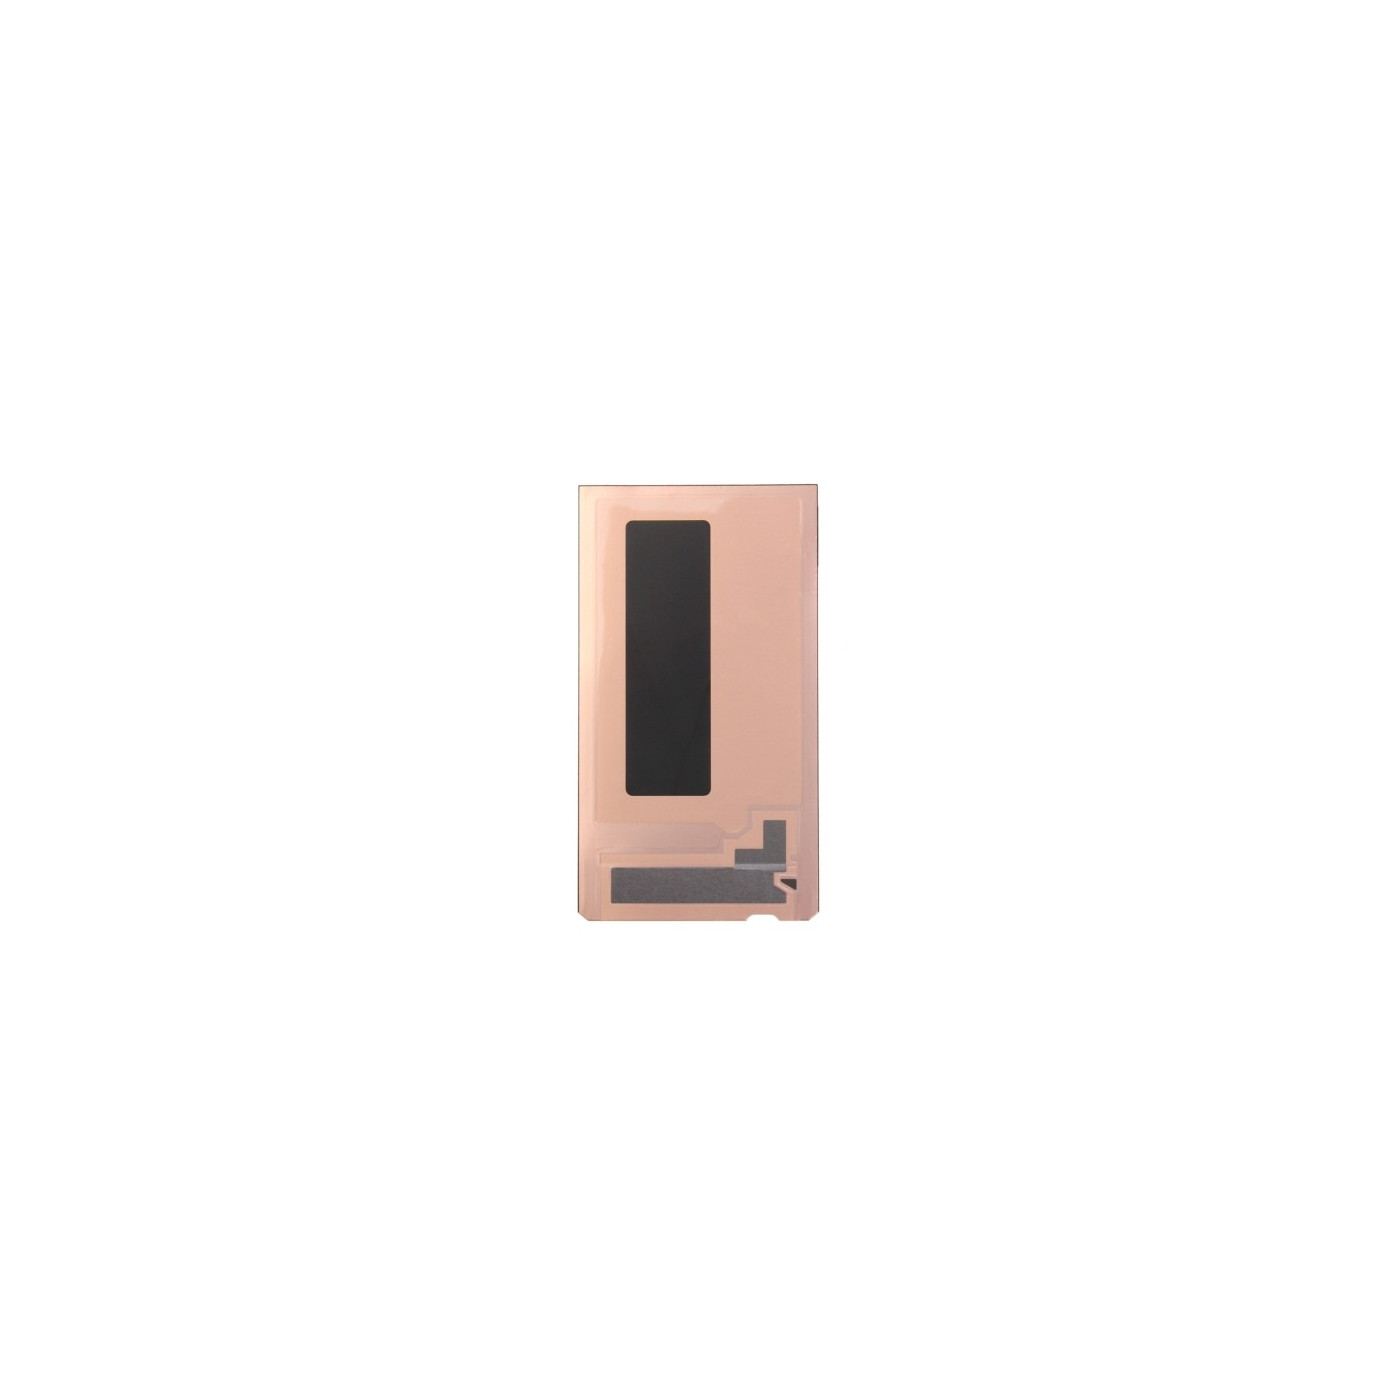 STICKER BACK LCD Samsung Galaxy S7 Edge G935 STICKER GLUE FRAME REAR